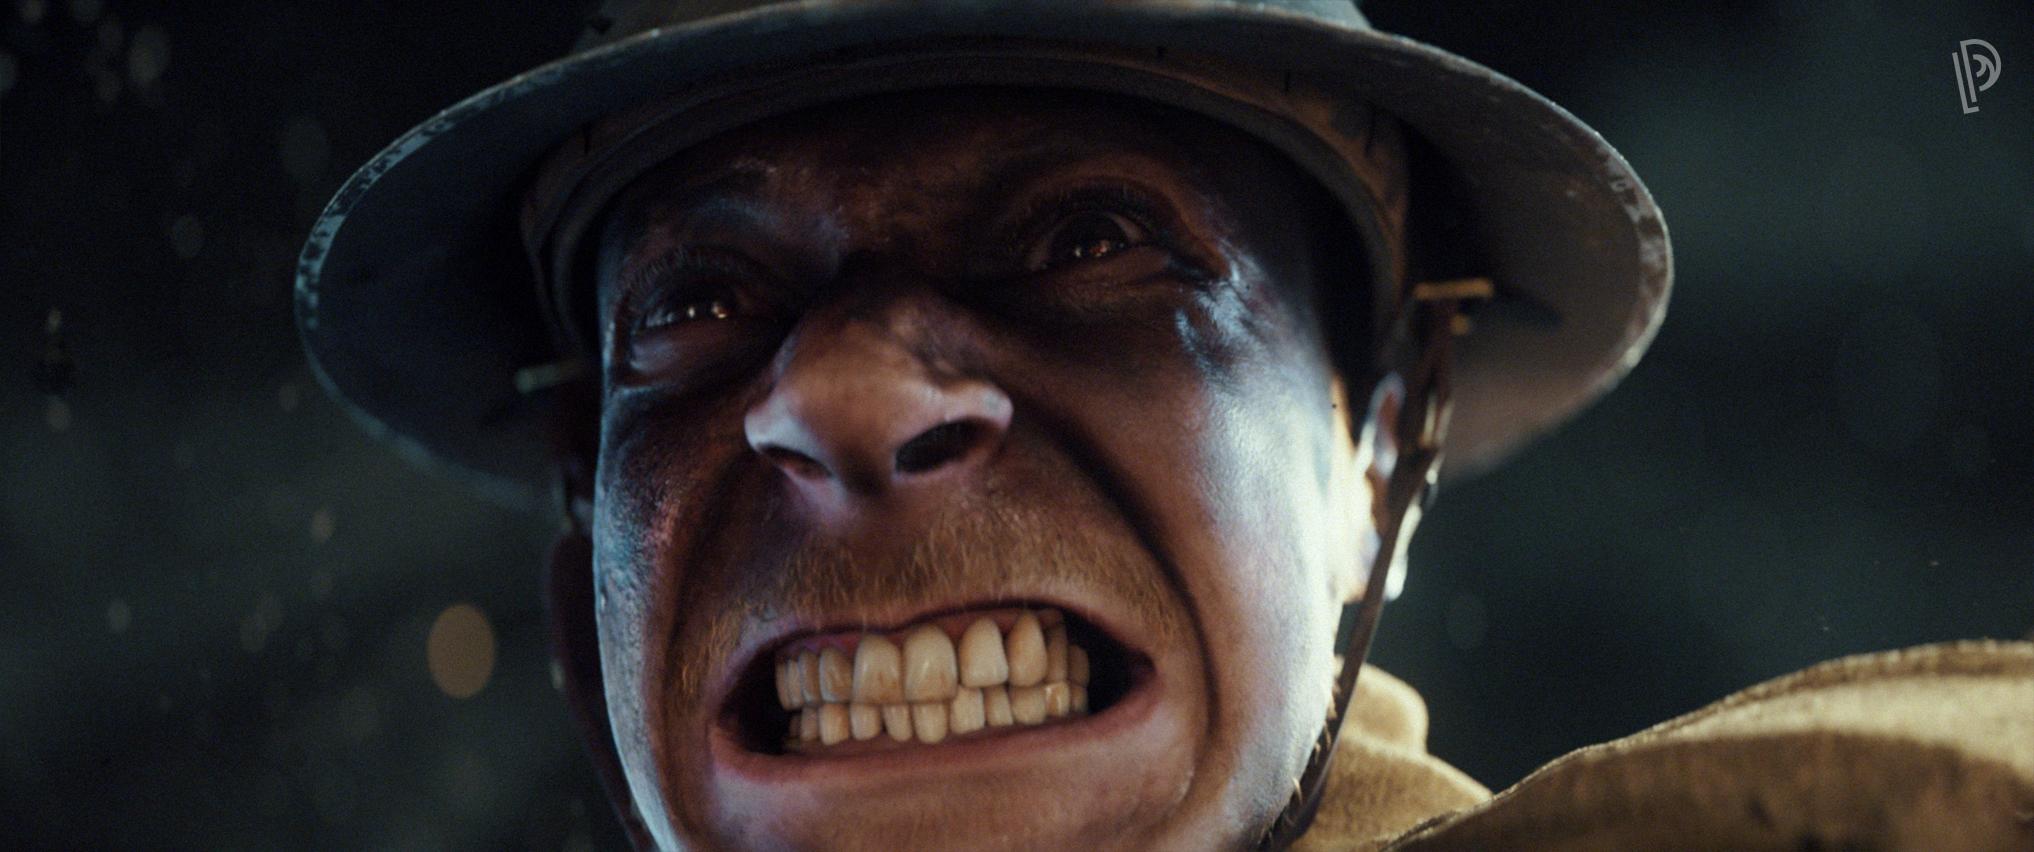 soldier: look development, texturing, shading, rendering